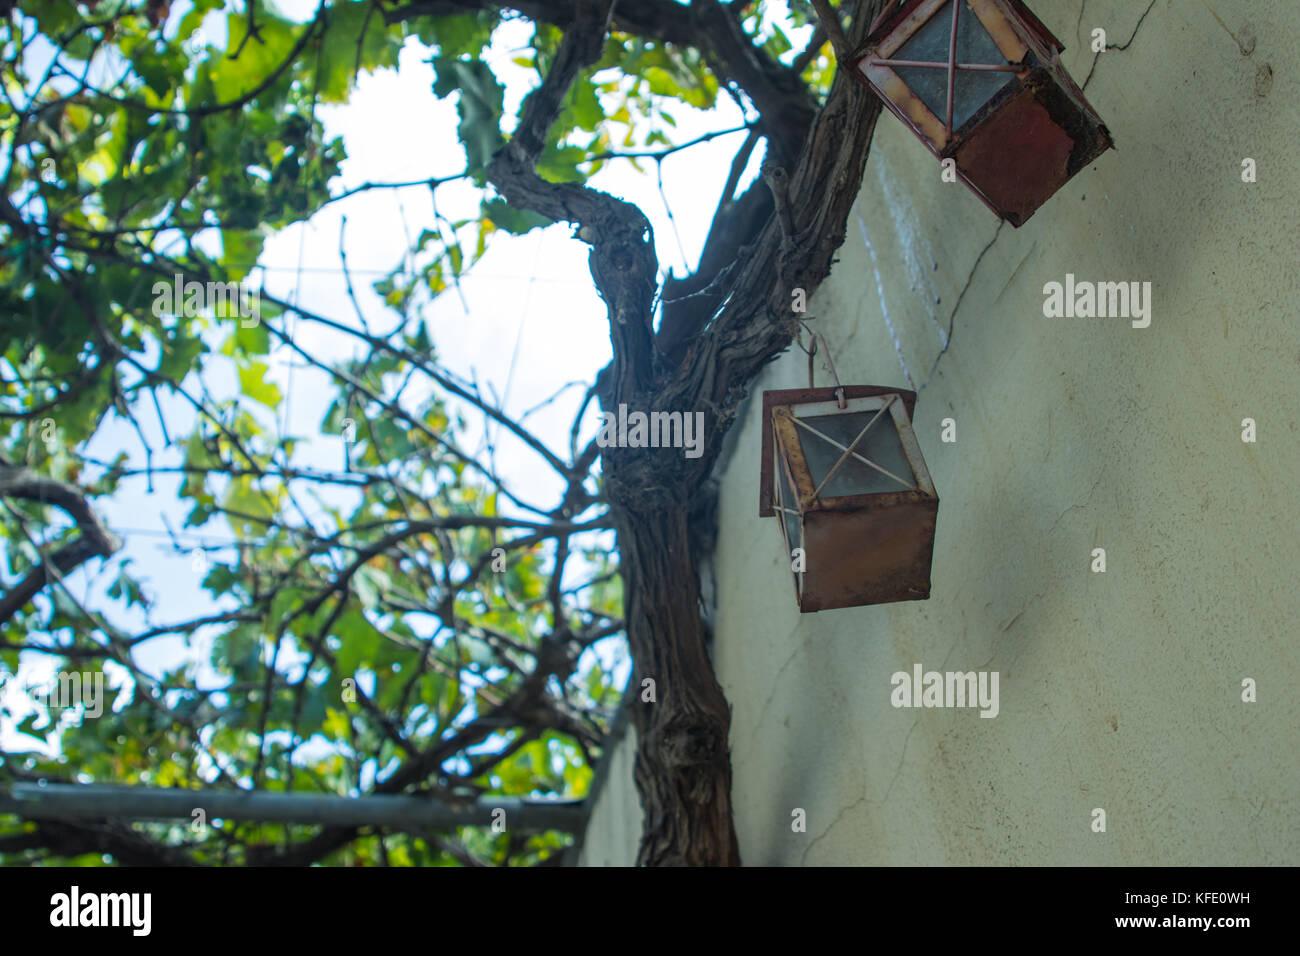 rusty garden lights - Stock Image